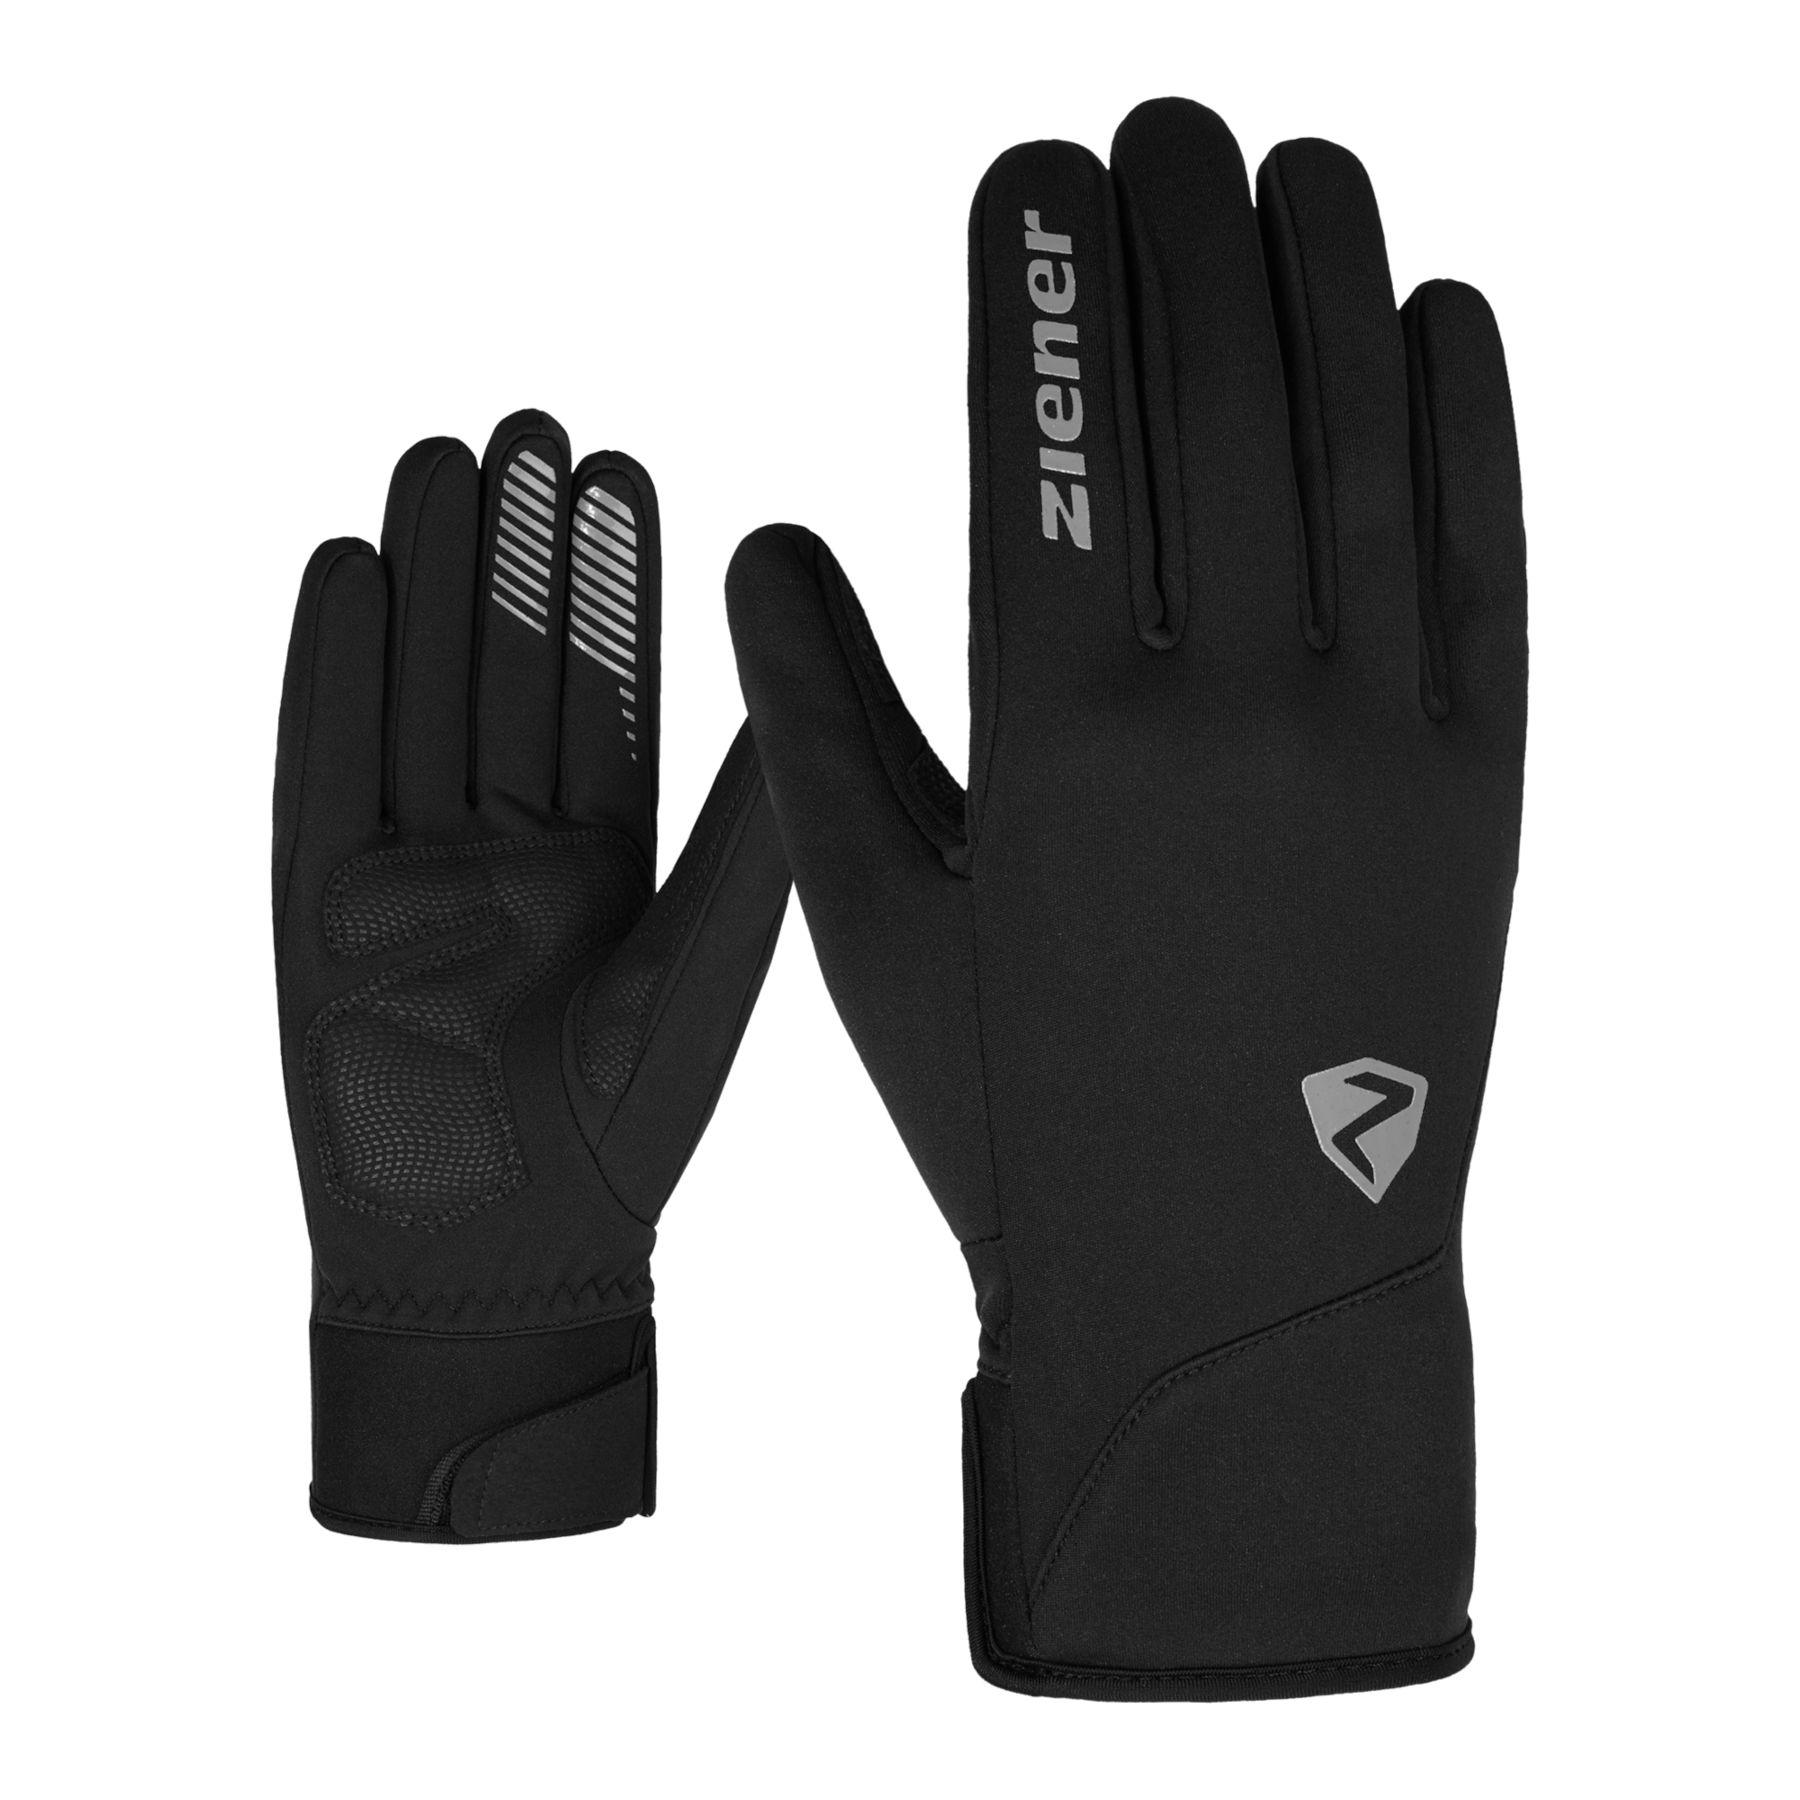 Image of Ziener SMU 20-Bike 234 Winter Gloves - black